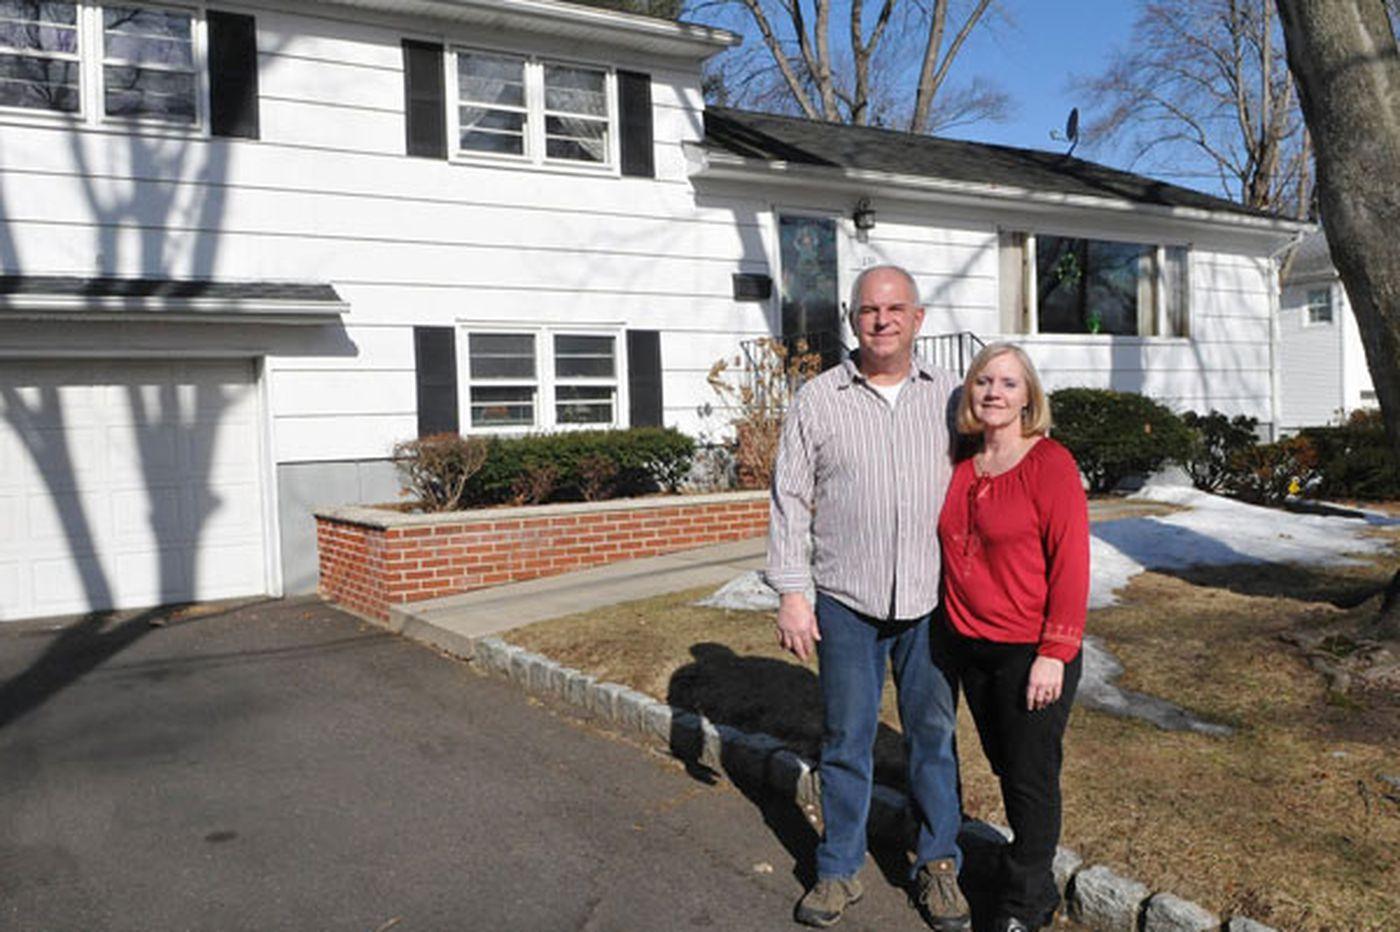 Split-levels keep attracting buyers